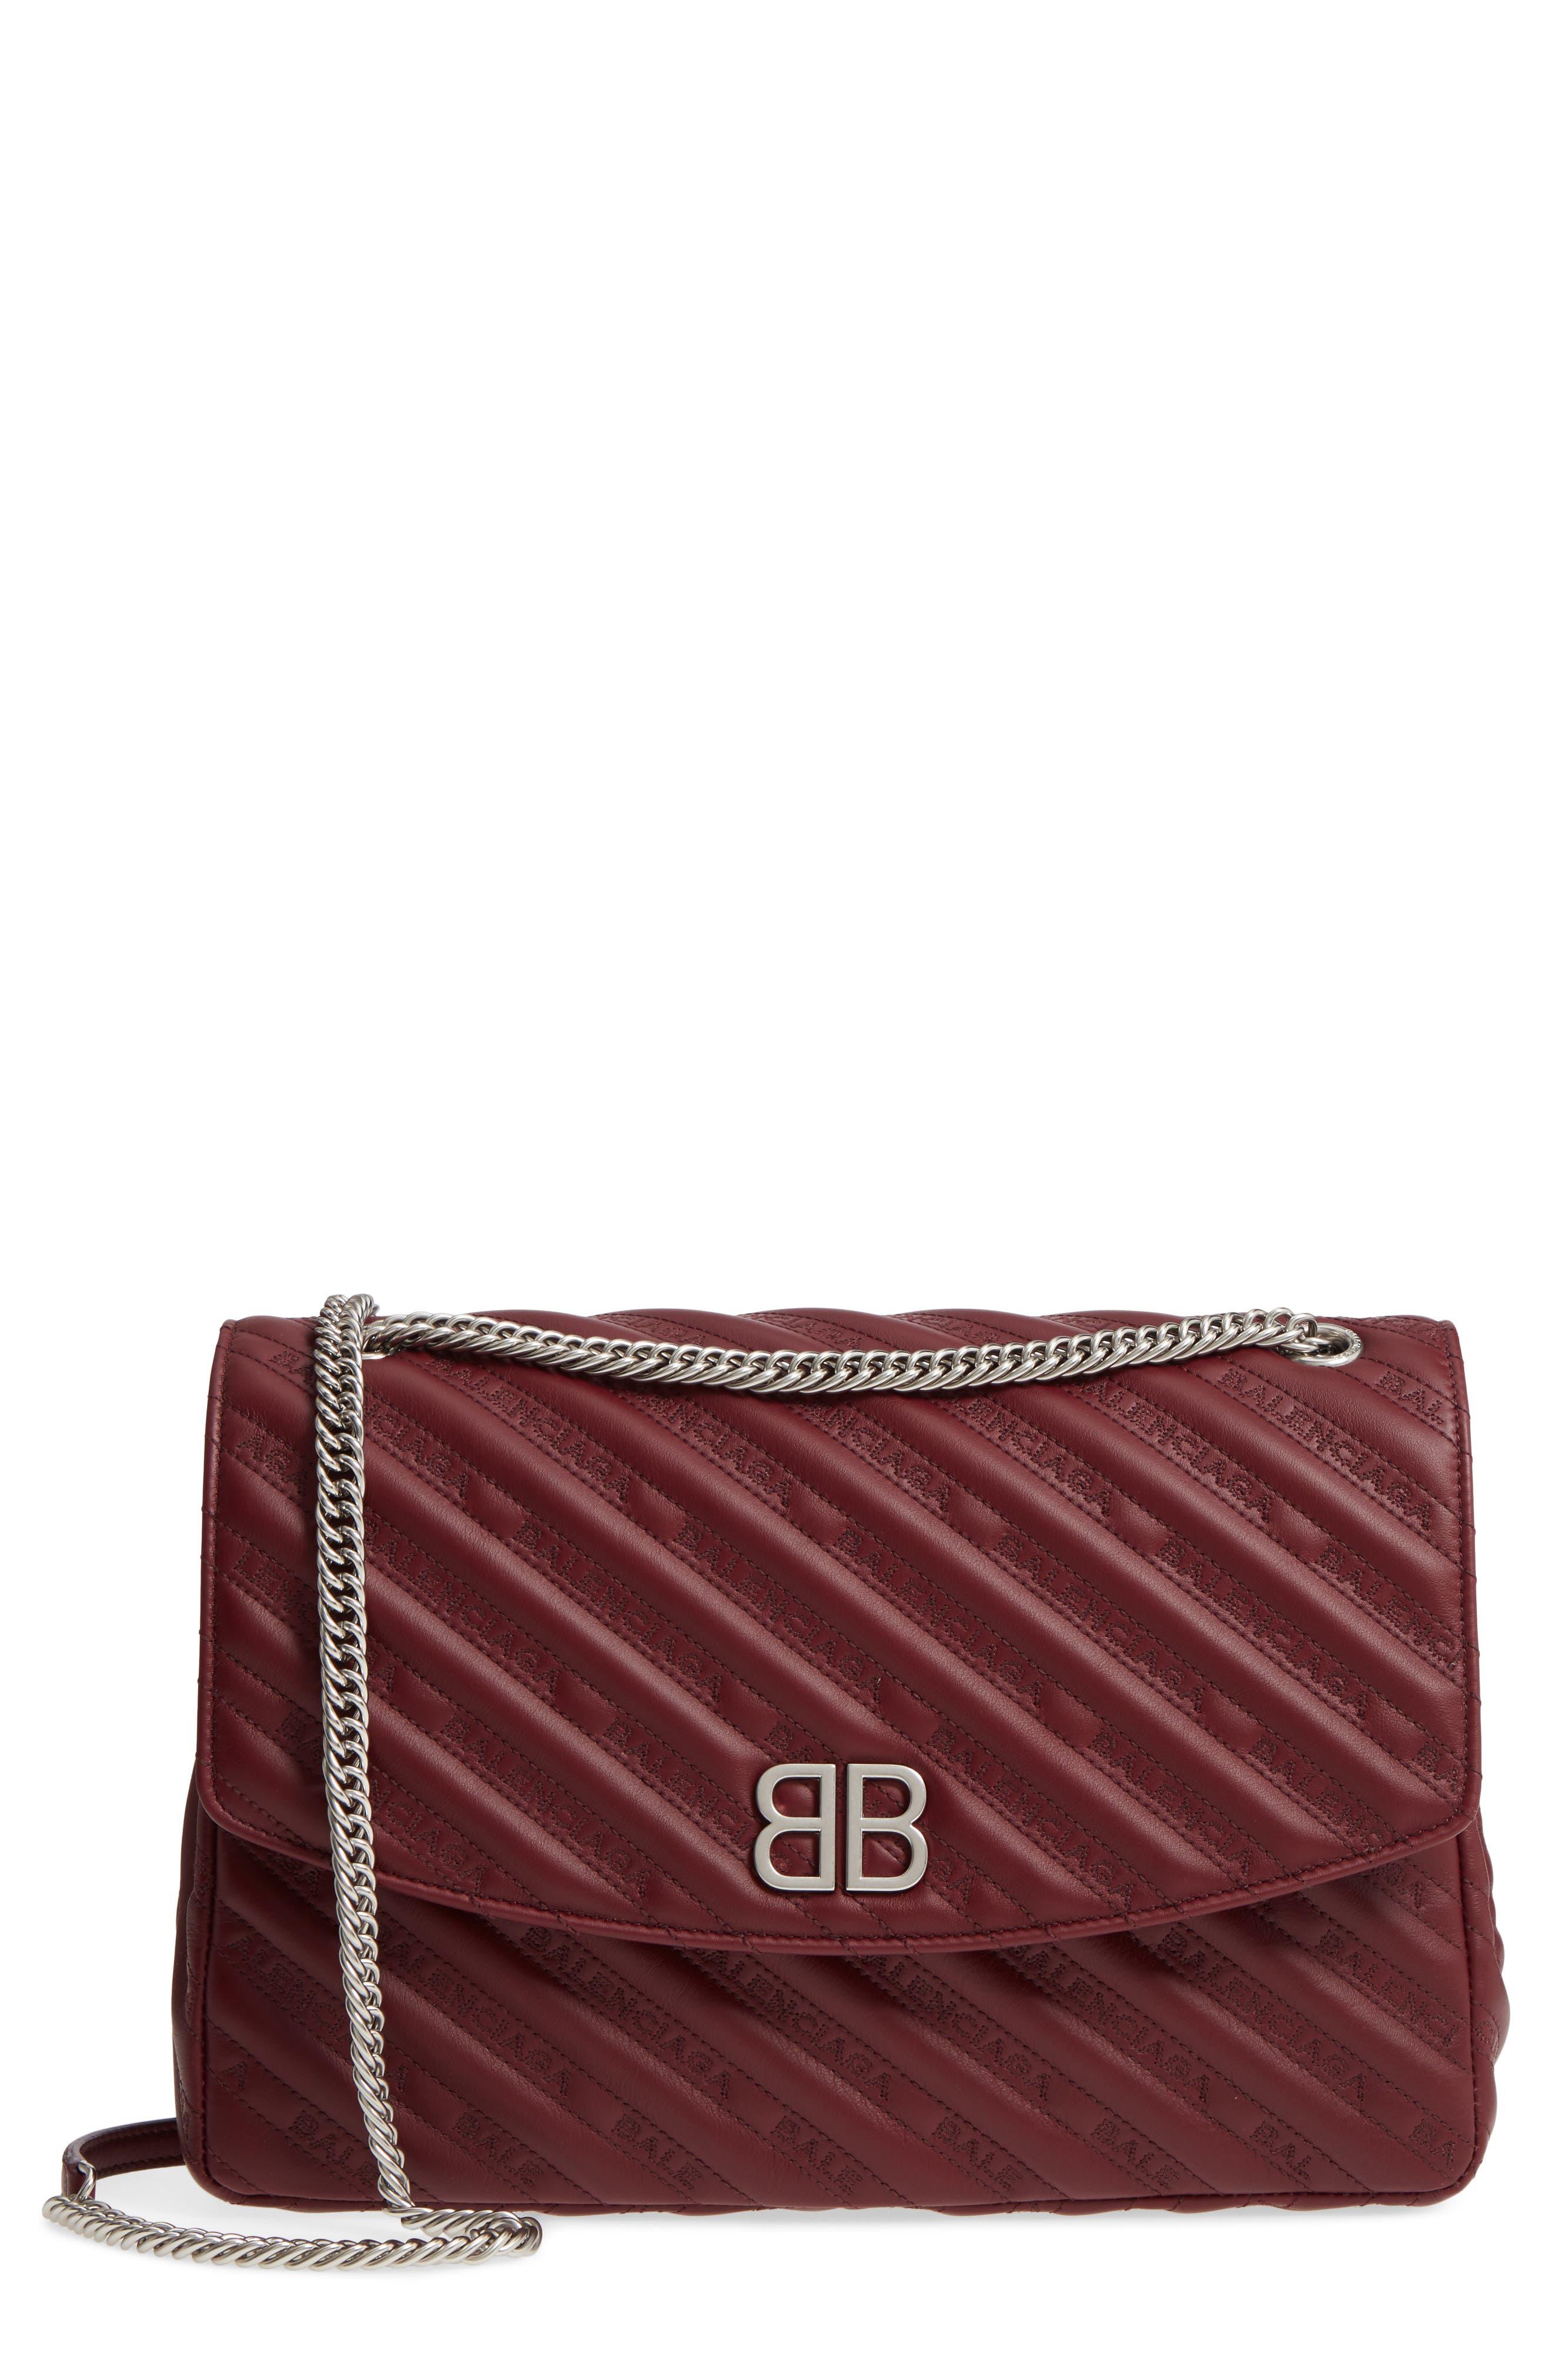 Balenciaga Matelassé Calfskin Leather Shoulder Bag